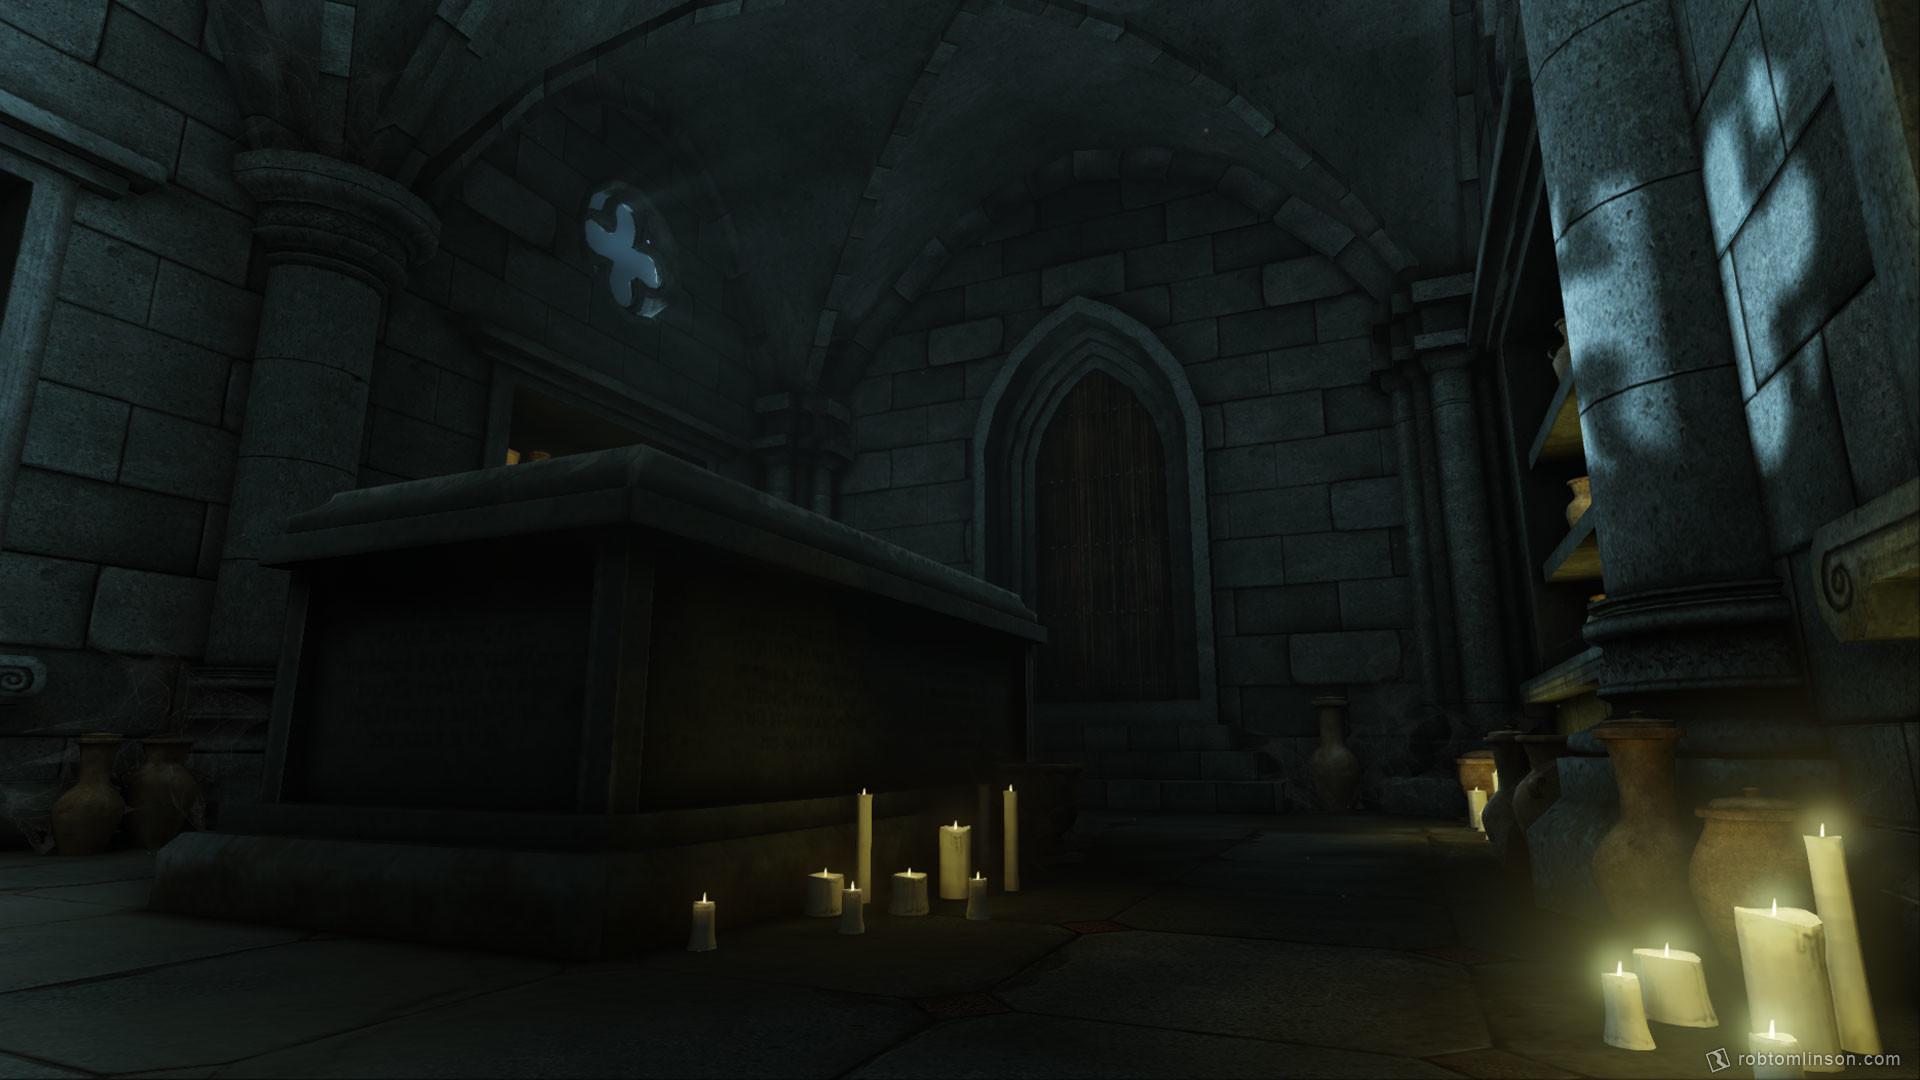 Rob tomlinson mausoleum 3